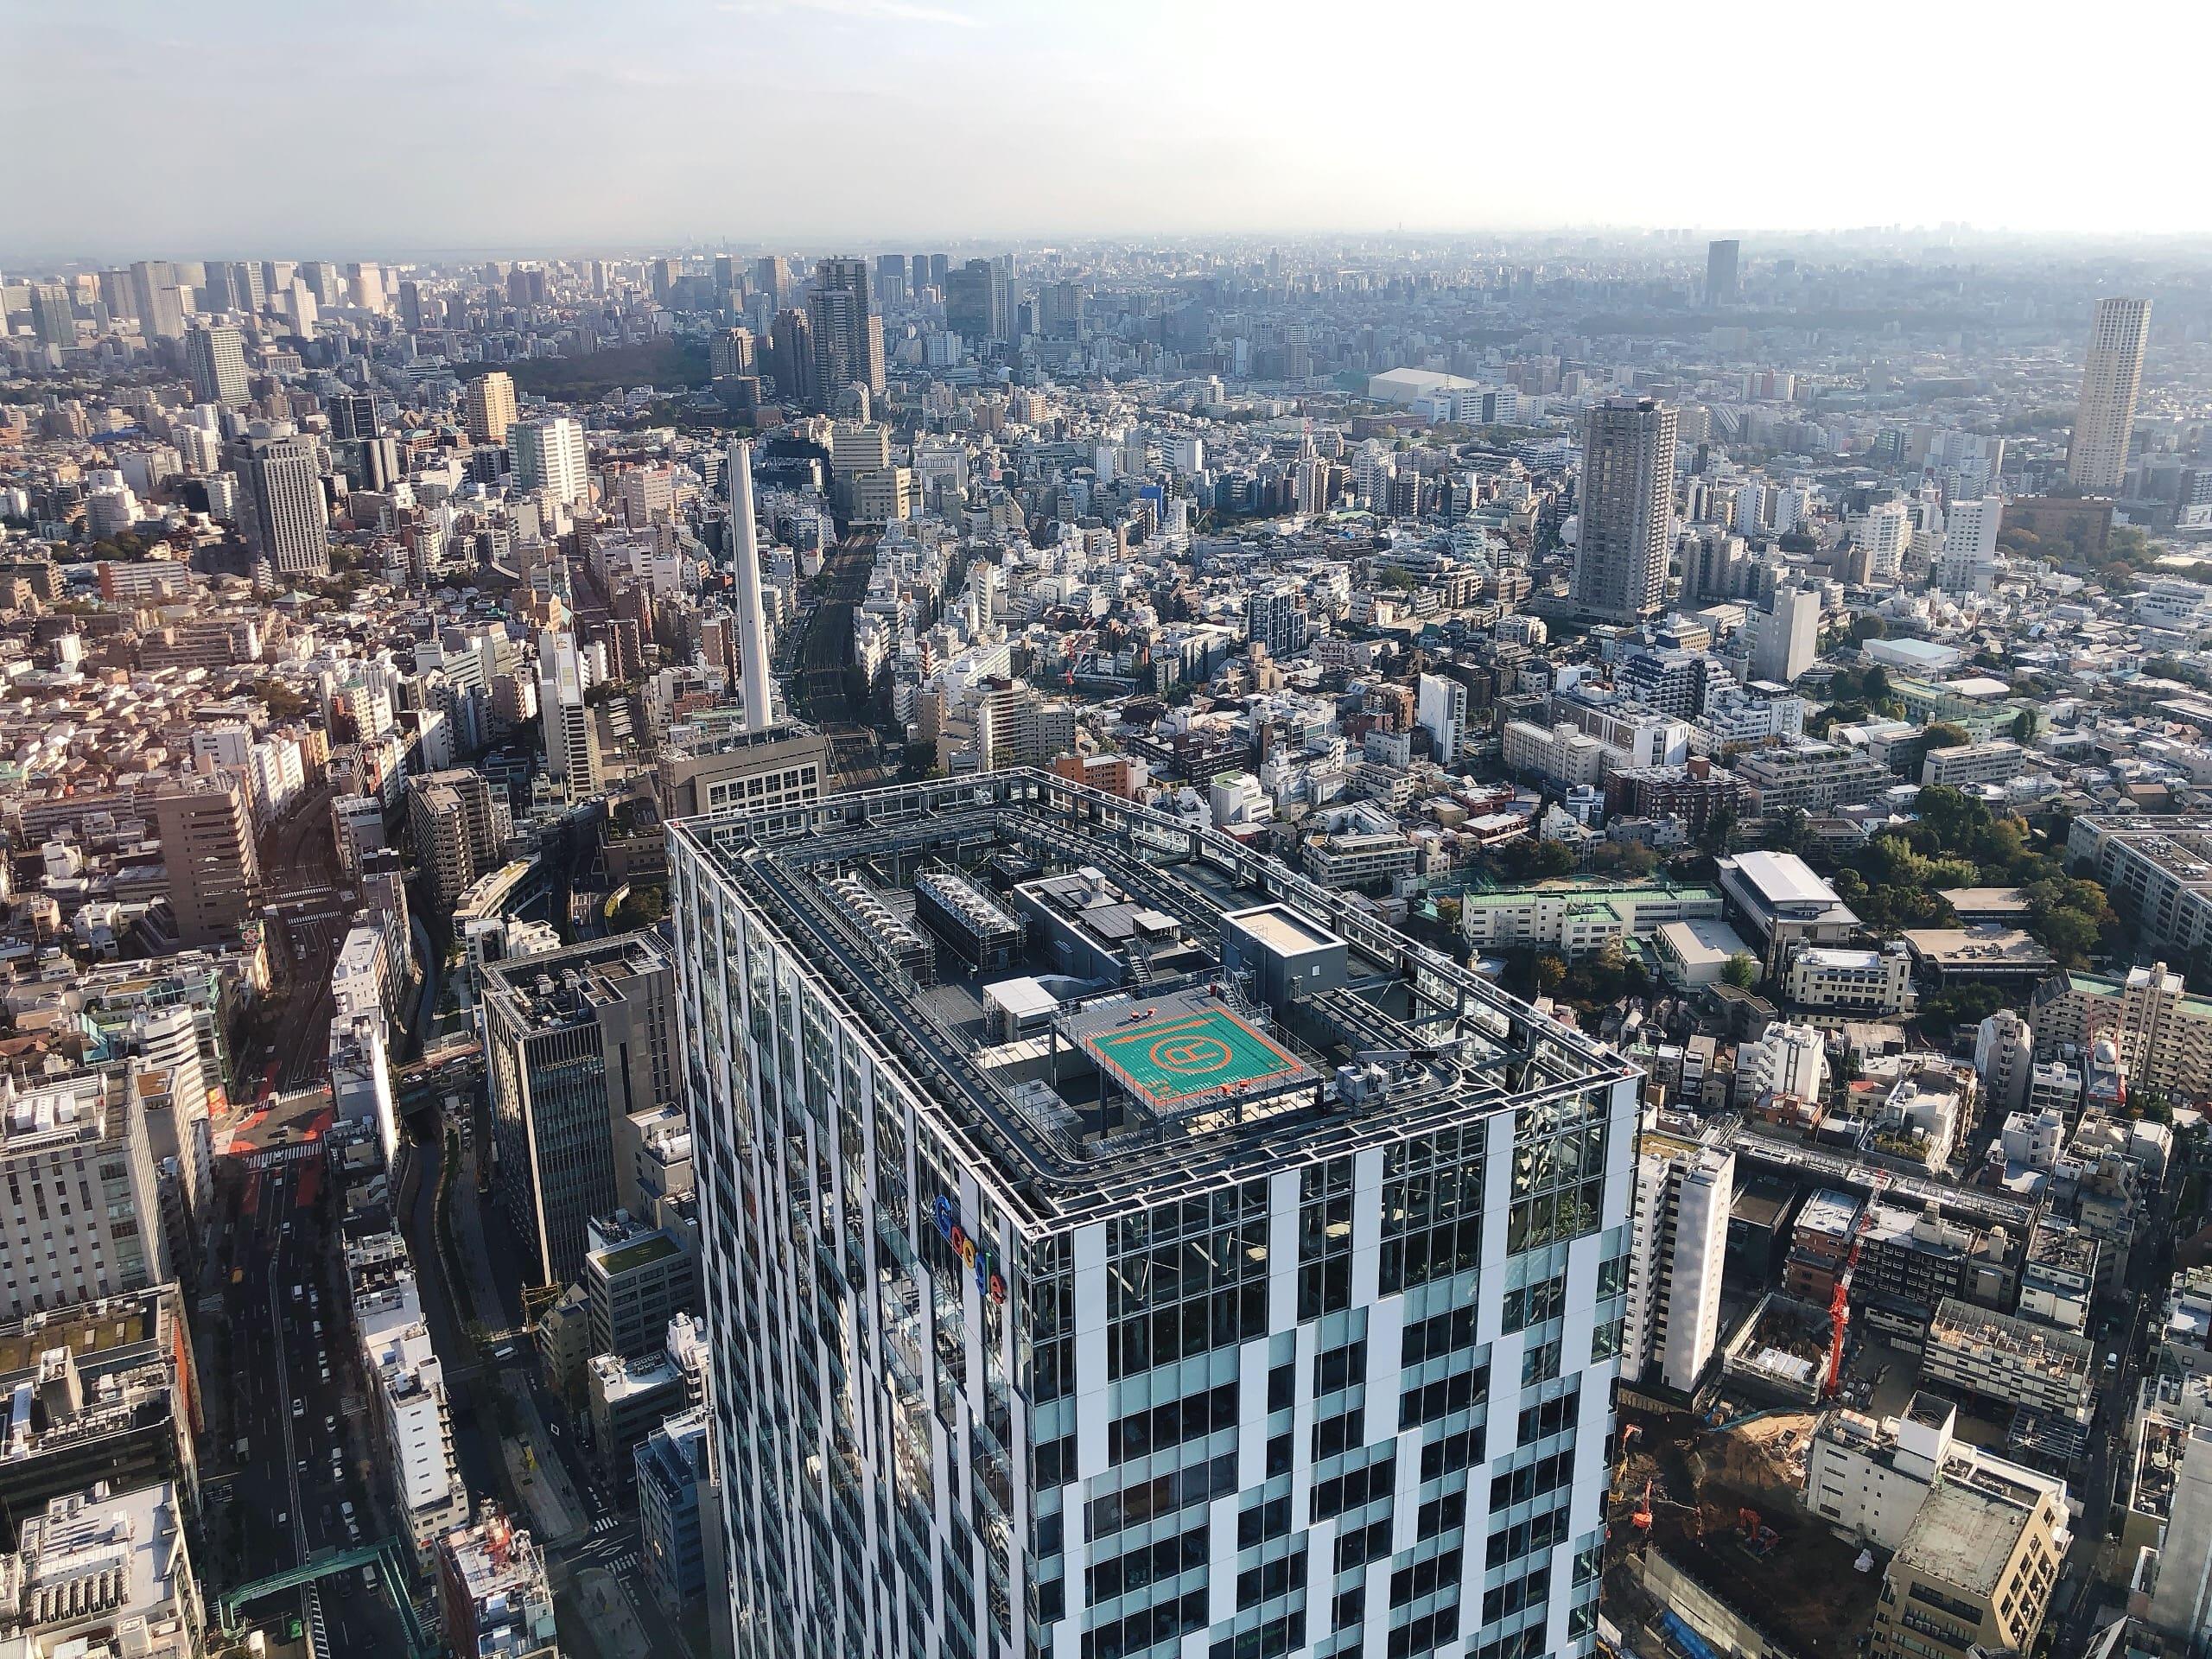 Views from Shibuya Sky